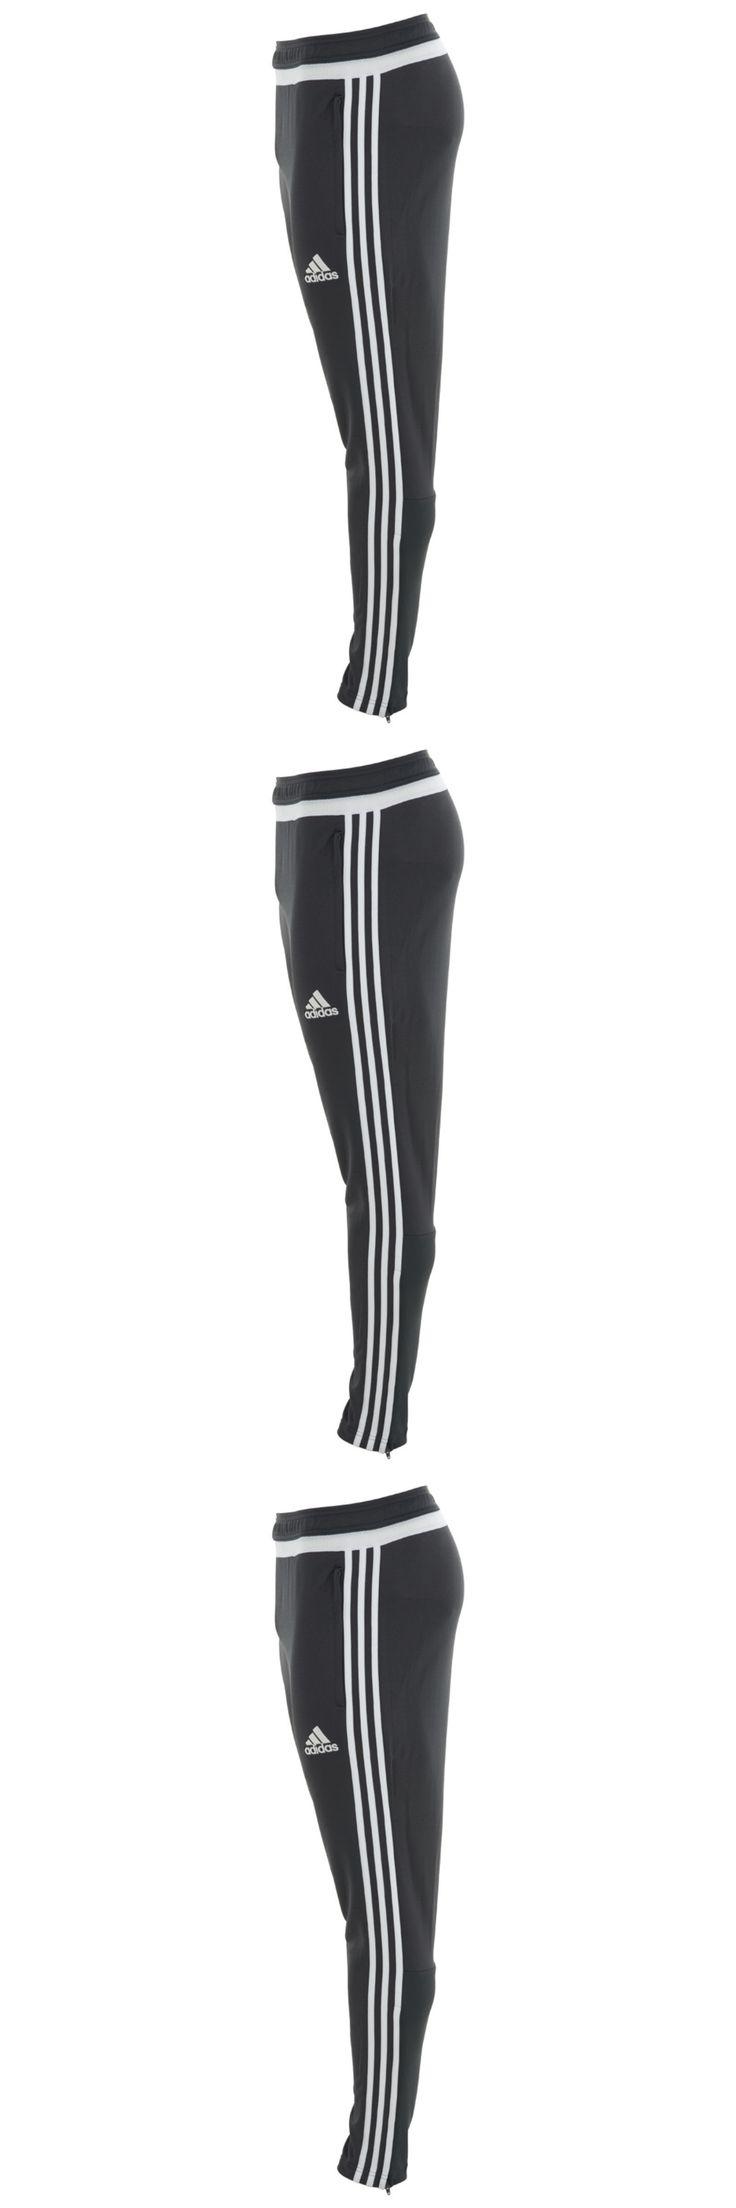 Men 123490: Adidas Mens Tiro 15 Training Pants (Grey White) S30155 -> BUY IT NOW ONLY: $33.99 on eBay!